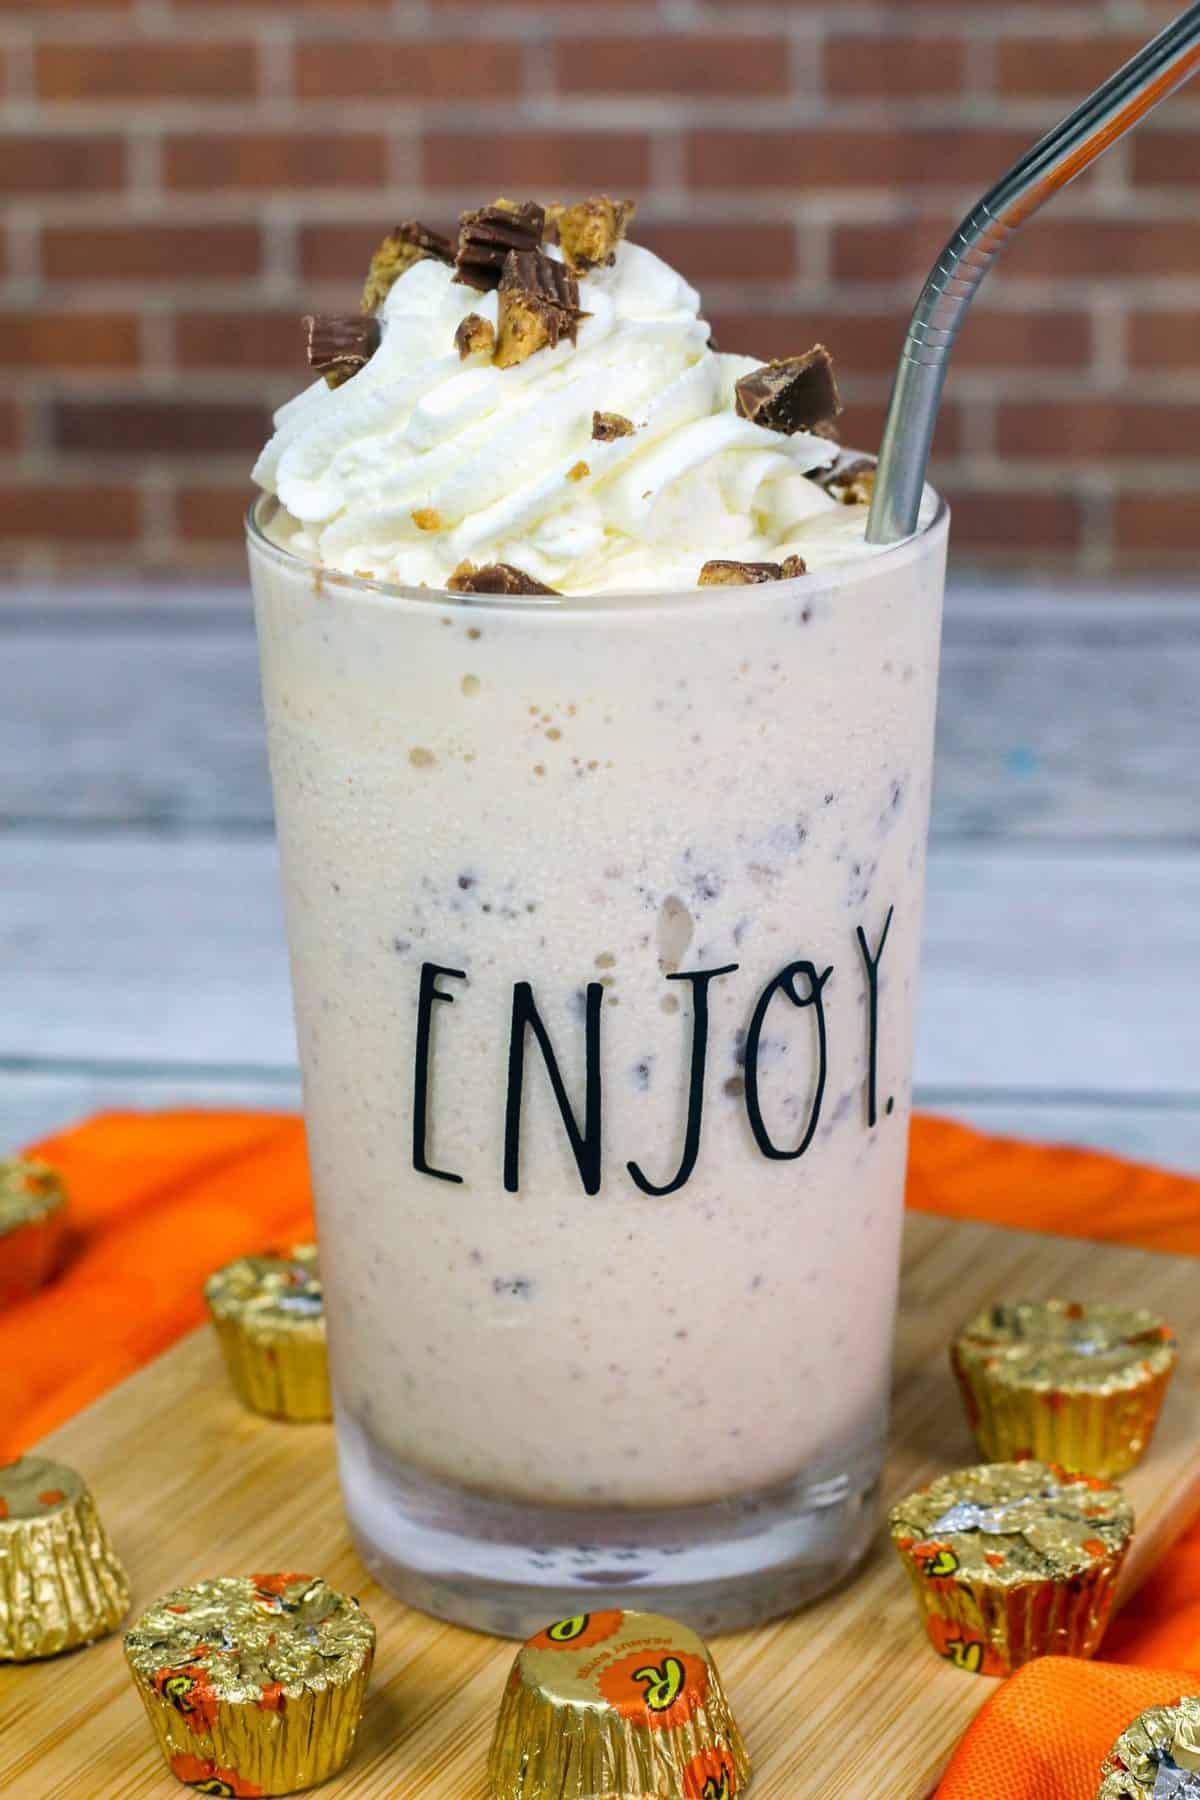 Boozy Reese's Peanut Butter Milkshake Recipe, Peanut Butter Milkshake, Reese's Peanut Butter Milkshake